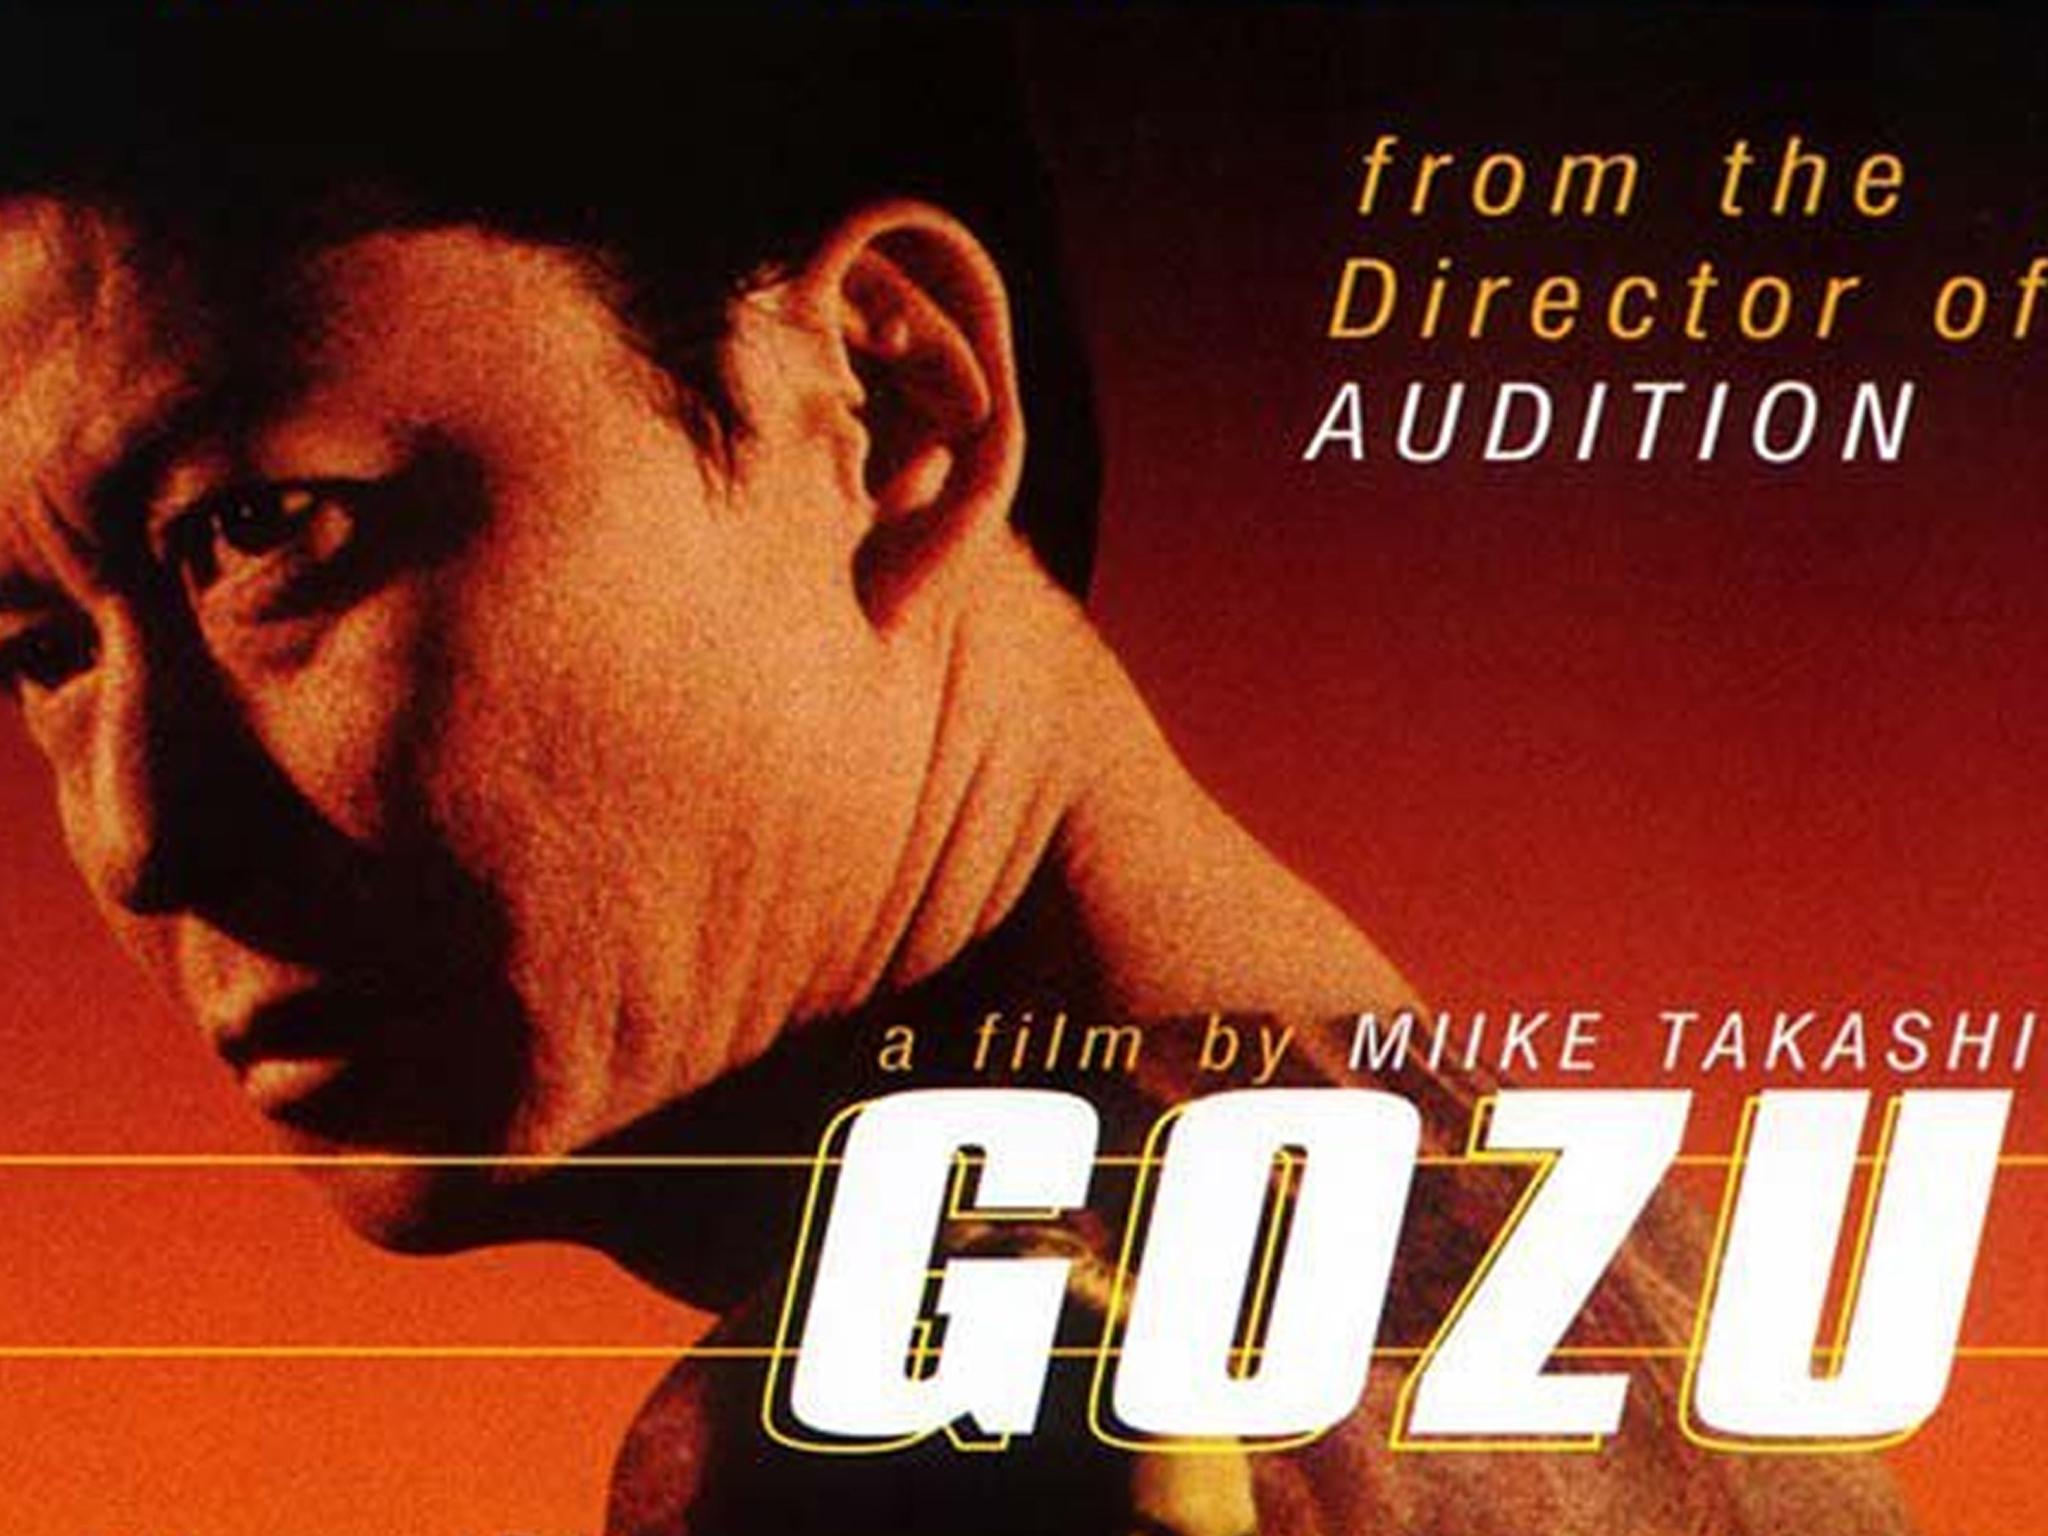 Chaos ensues when a yakuza boss orders a young gangster to kill an insane colleague. Directed by Takeshi Miike.